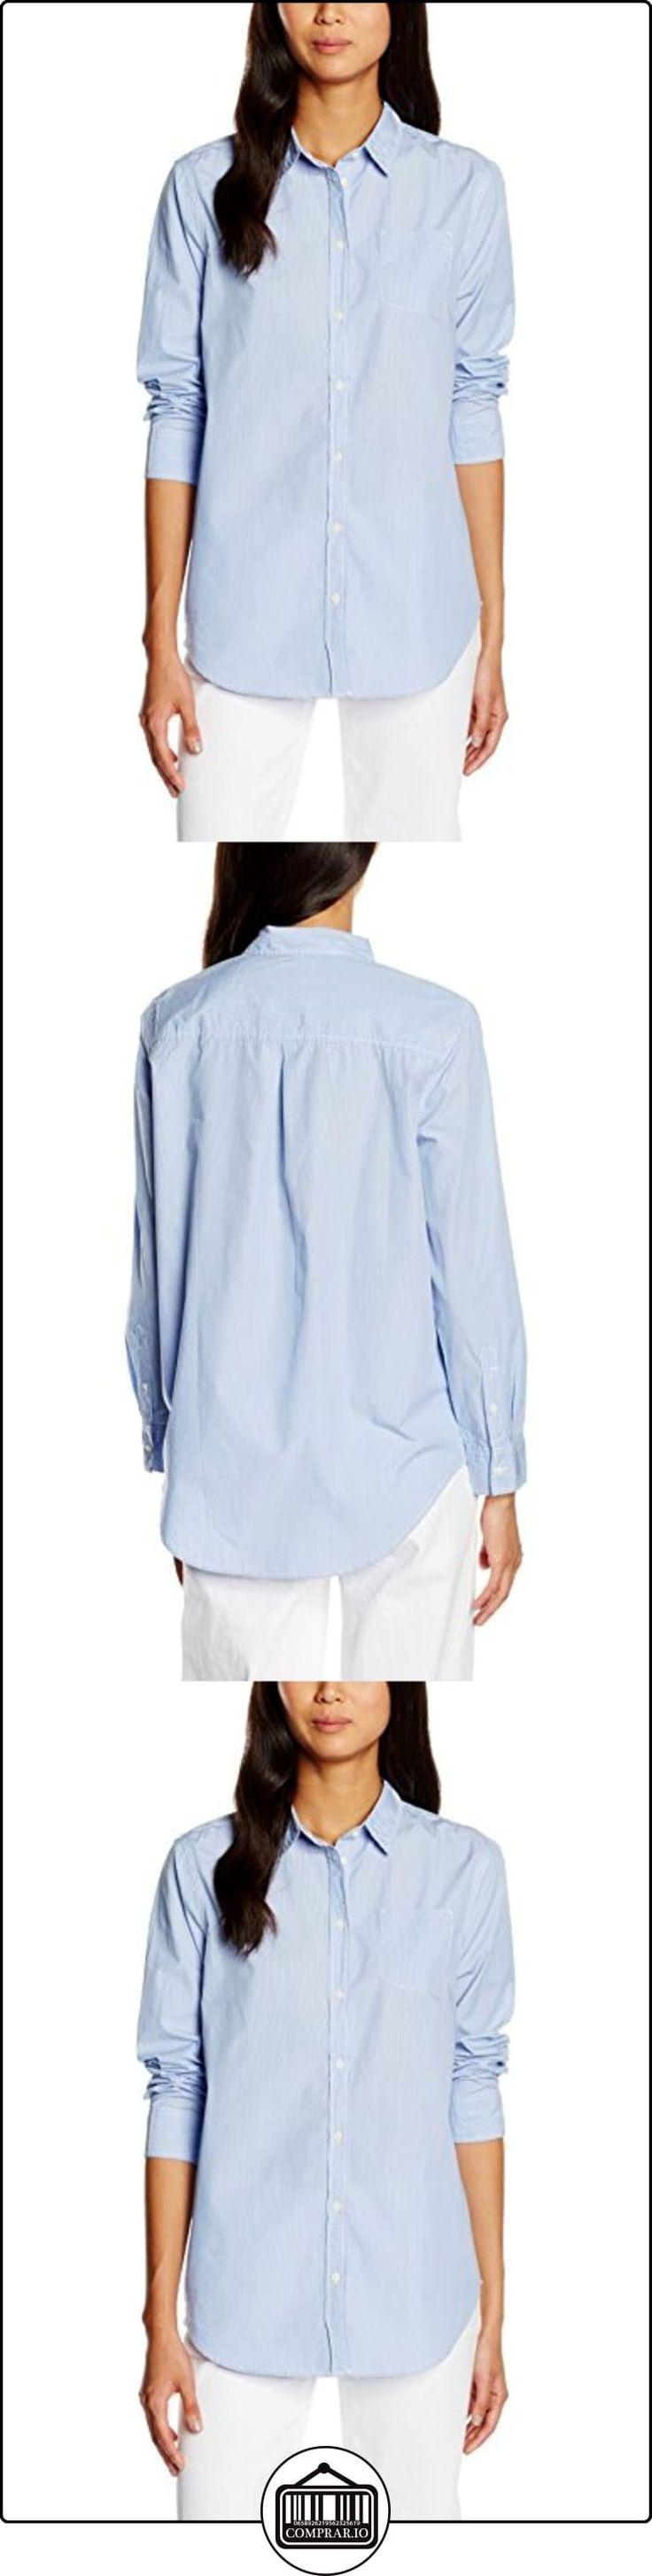 Benetton 5SC55Q6L4, camisa Mujer, Azul (Blue), XL(UK) ✿ Blusas y camisas ✿